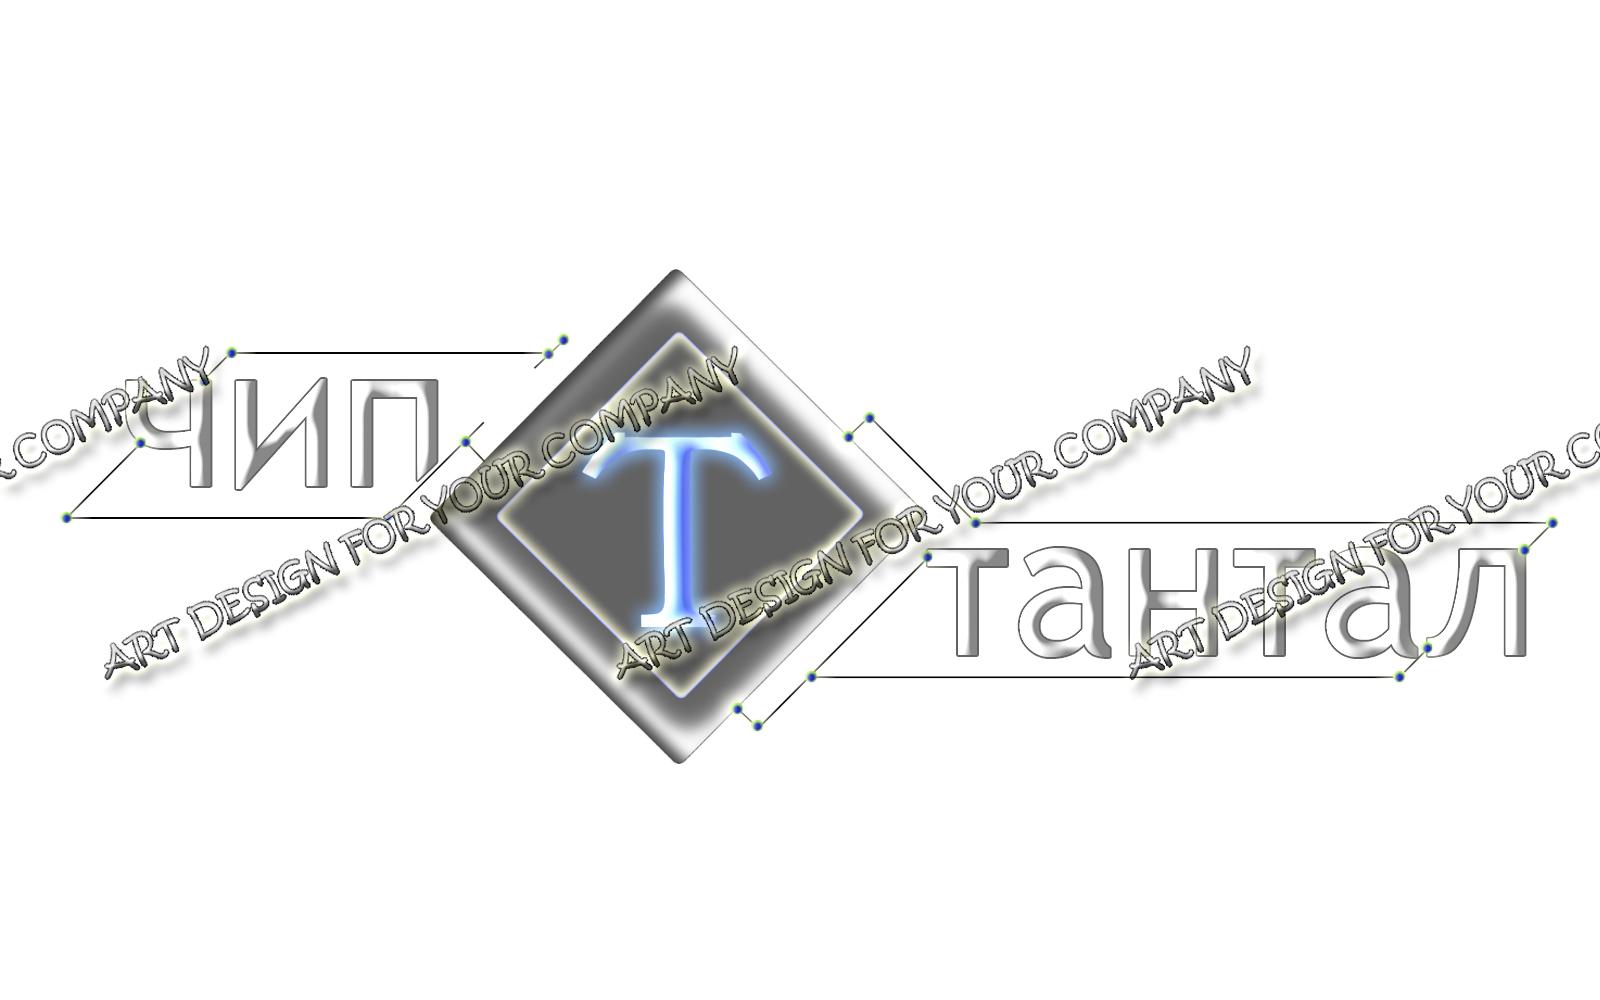 Логотип + Дизайн настольного календаря фото f_8065a27f120a09ce.jpg